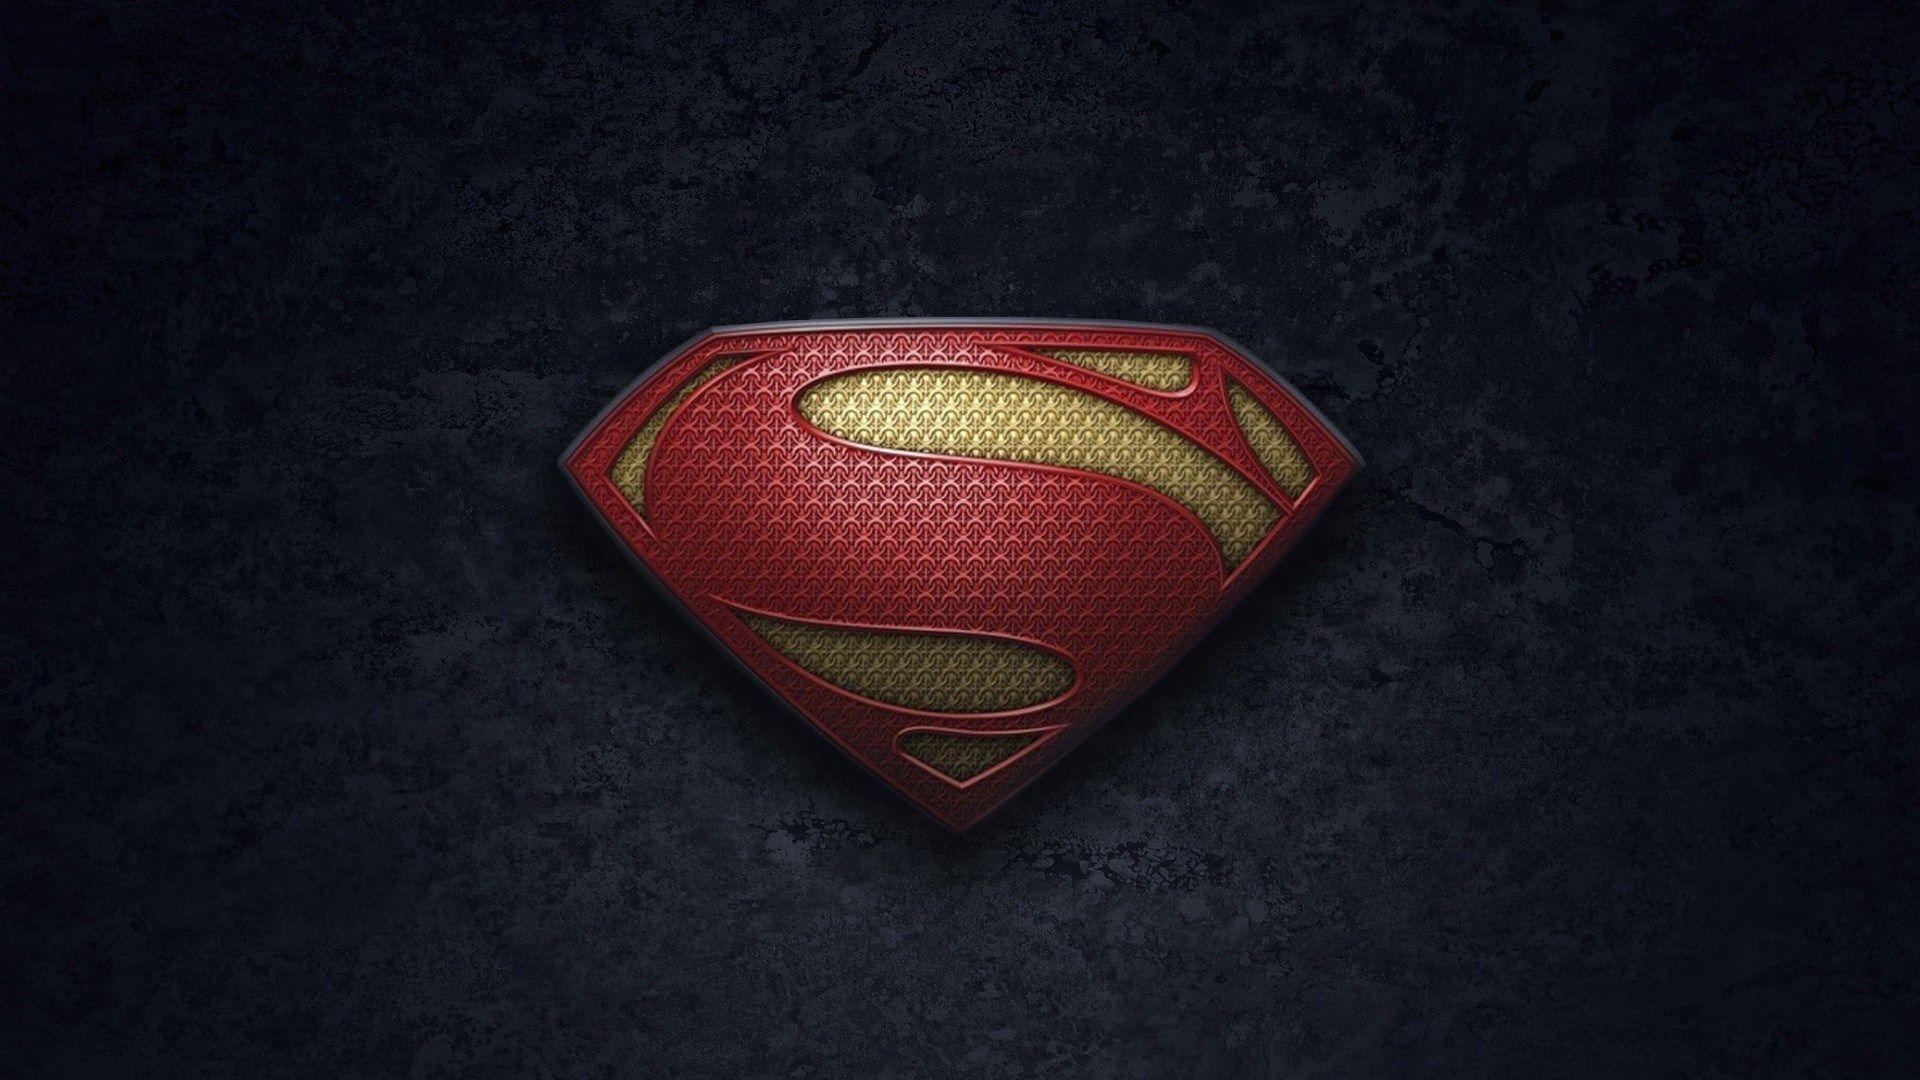 best ideas about superman hd wallpaper on pinterest superman 1920